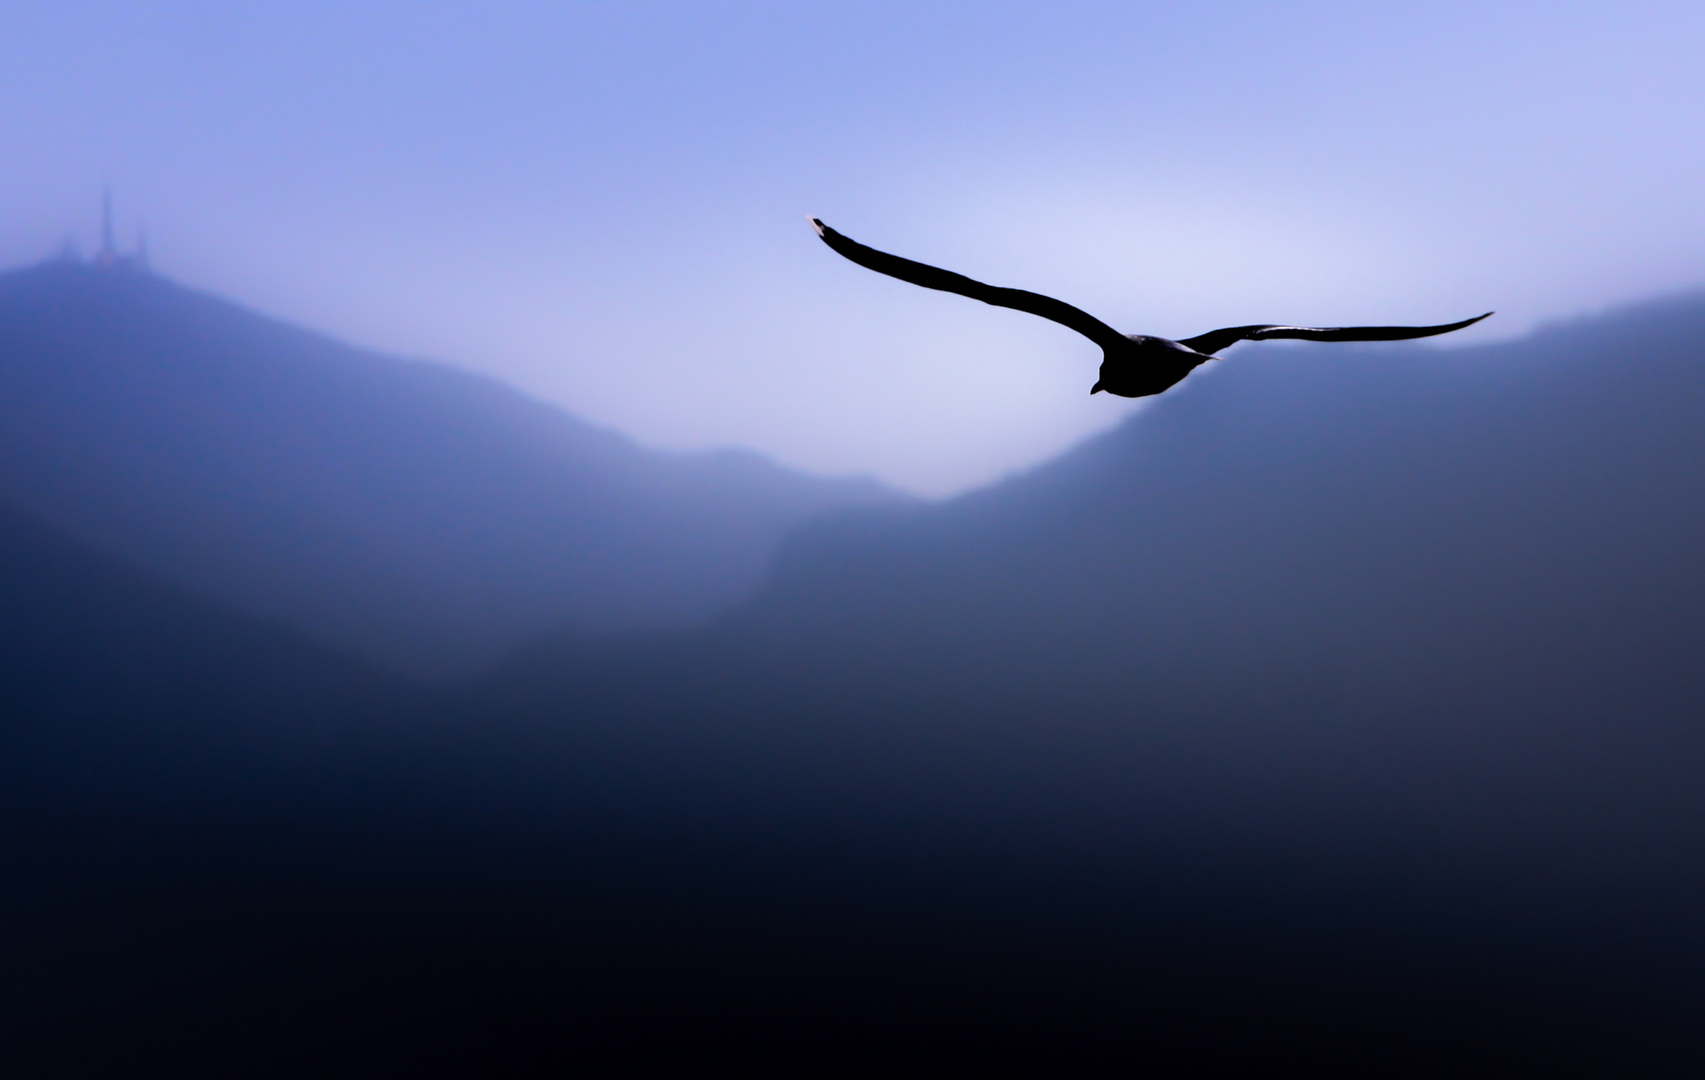 ....freedom....